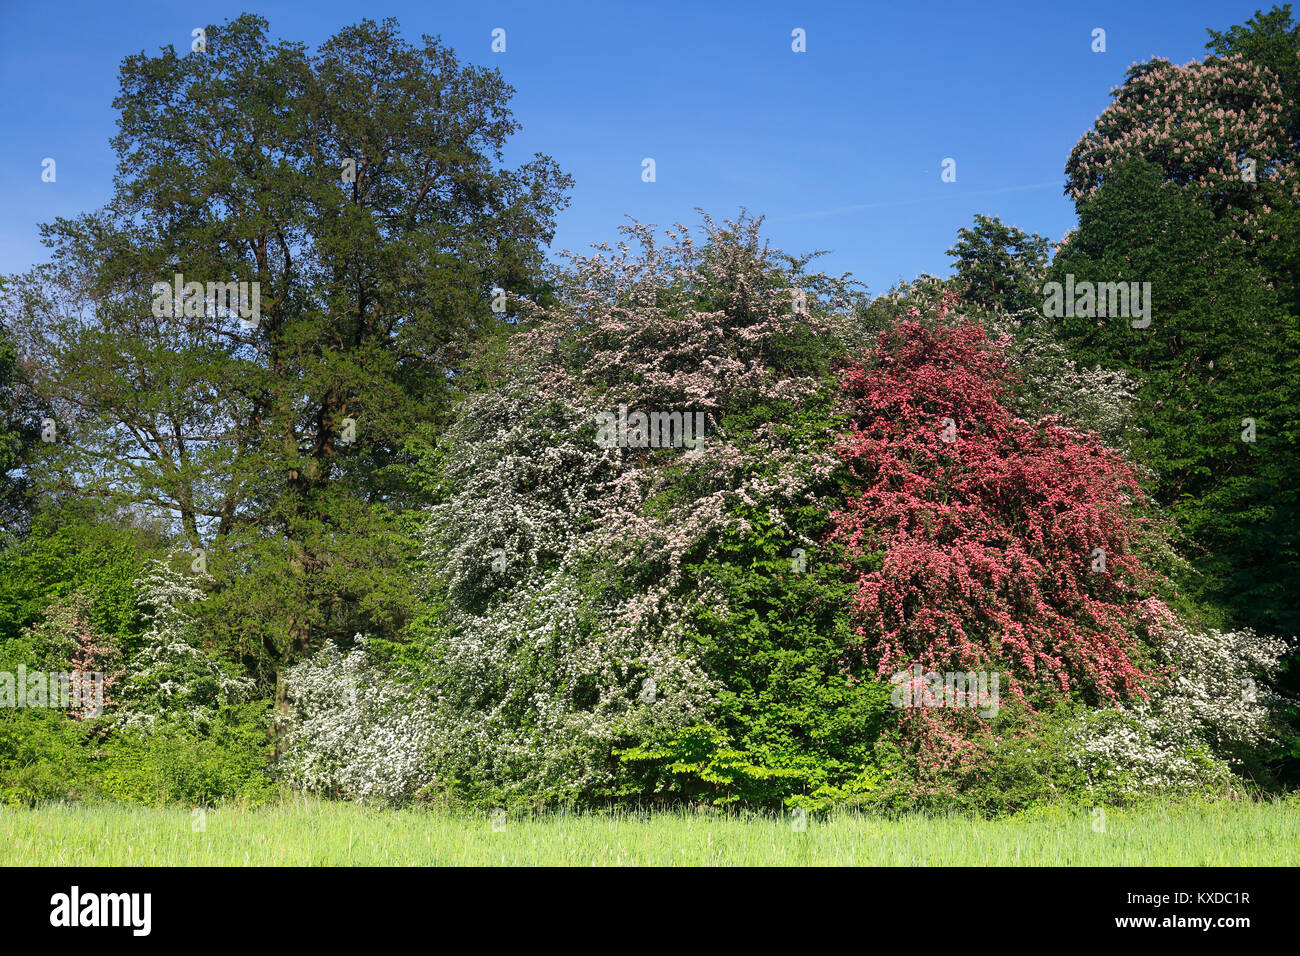 Flowering hawthorn (Crataegus monogyna) and Paul's Scarlet (Crataegus laevigata), Biosphere Reserve Middle Elbe, - Stock Image